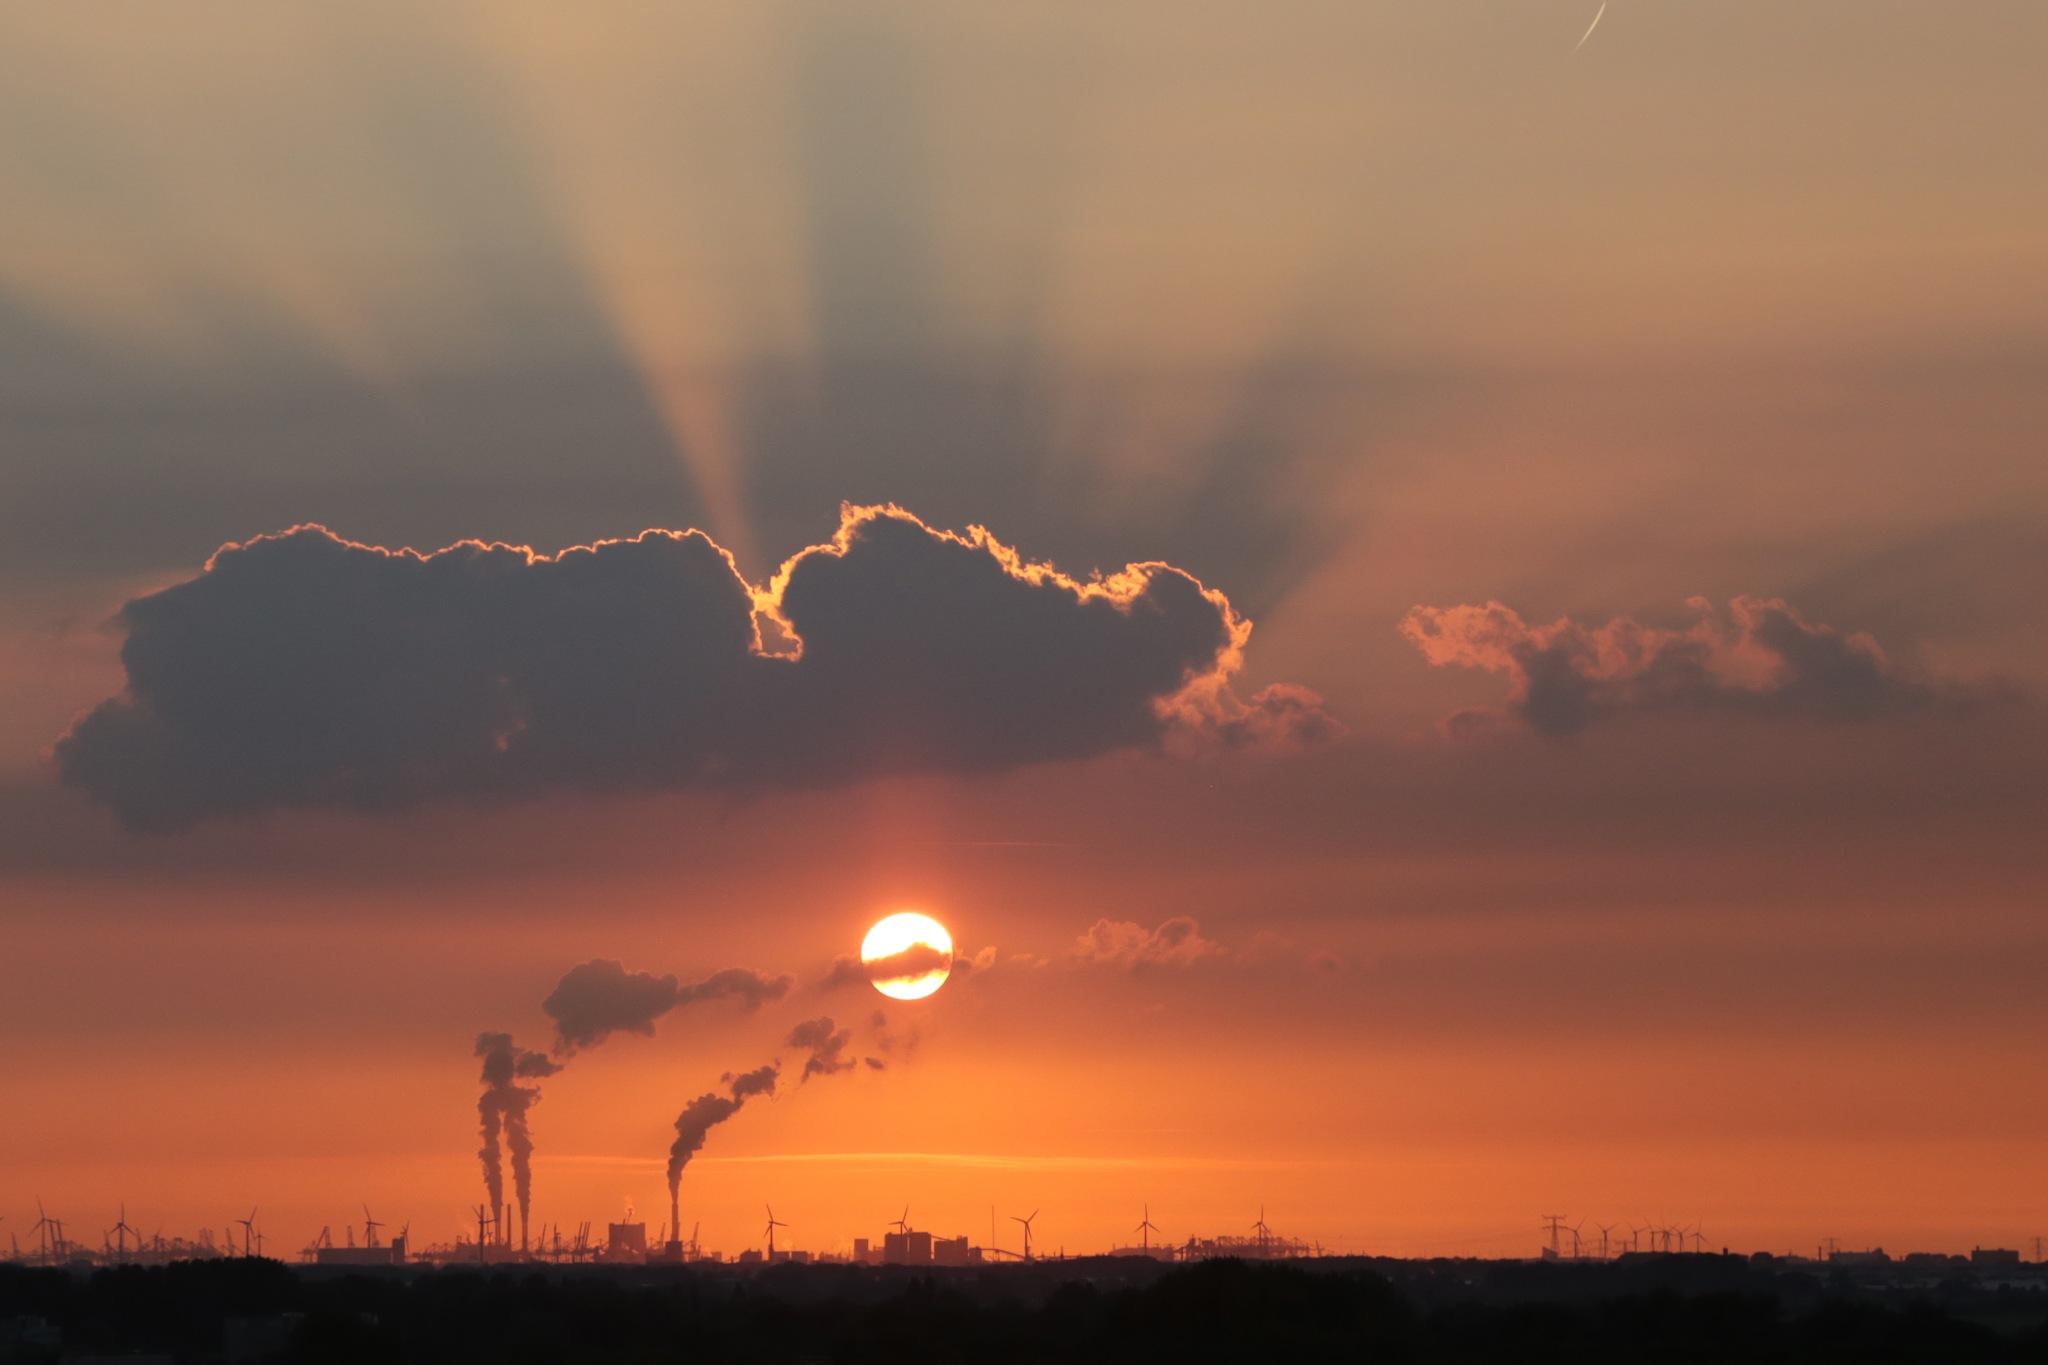 sunset by ambentum